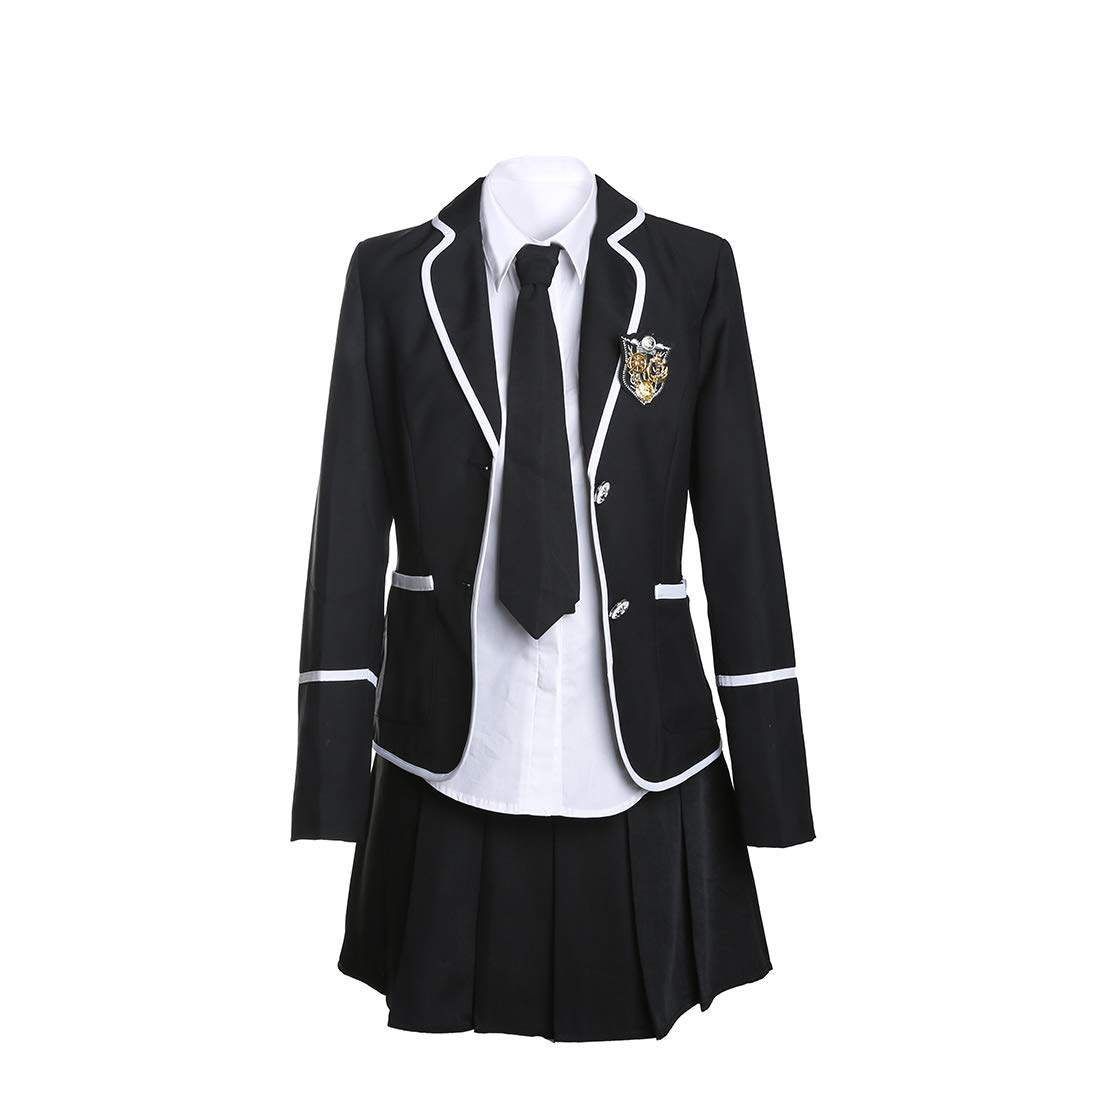 URSFUR School Girl Outfit - Japan Korean School Girl Costume Cosplay School Anime Costumes for Women